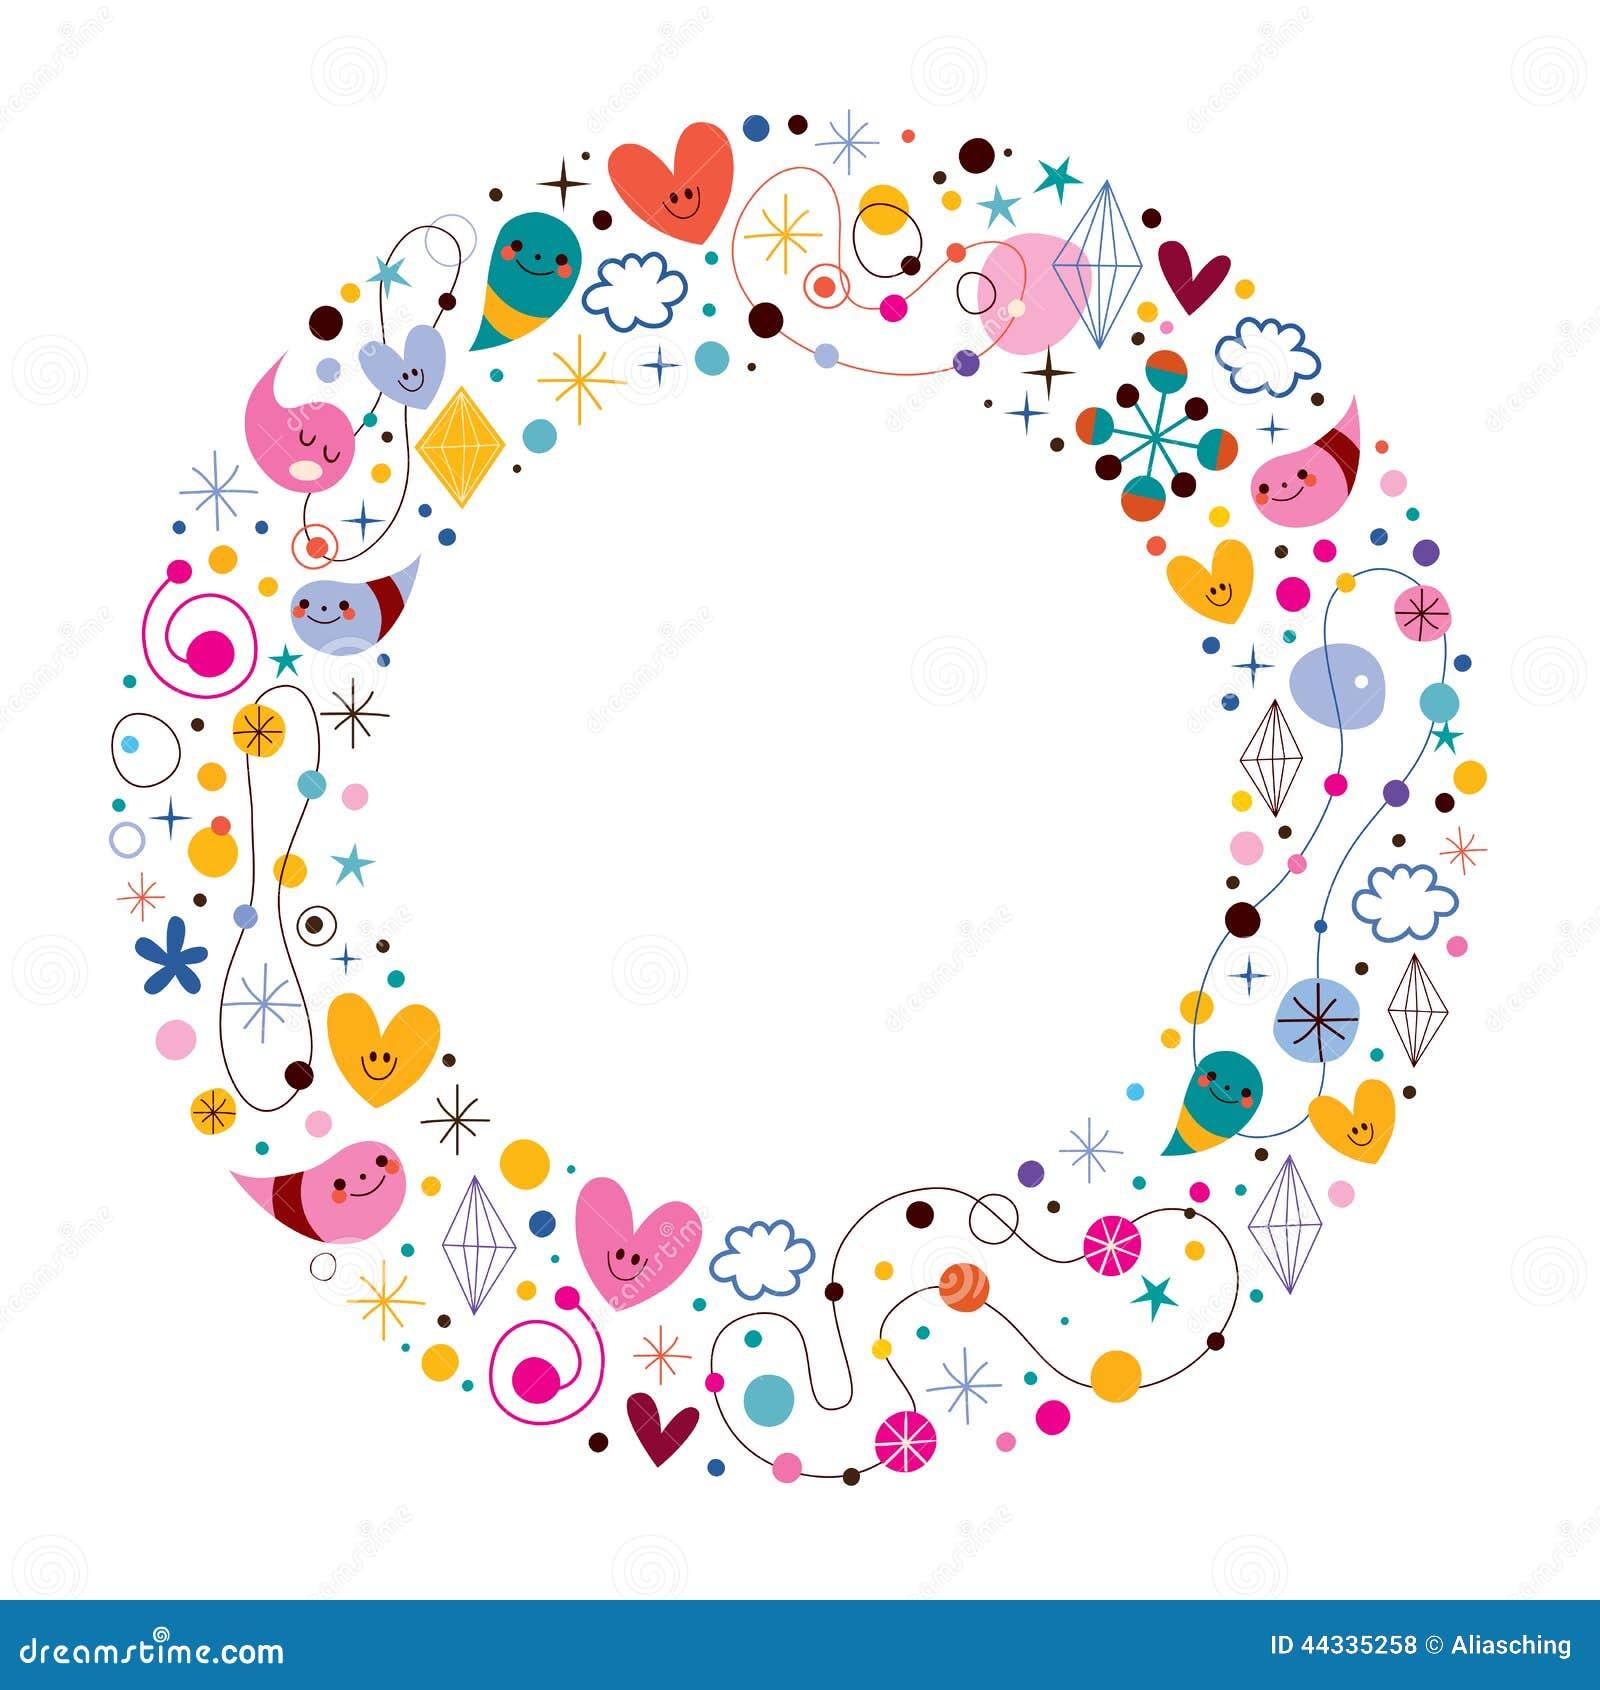 Celebration Happy Cartoon Circle Frame Stock Vector - Image: 44335258